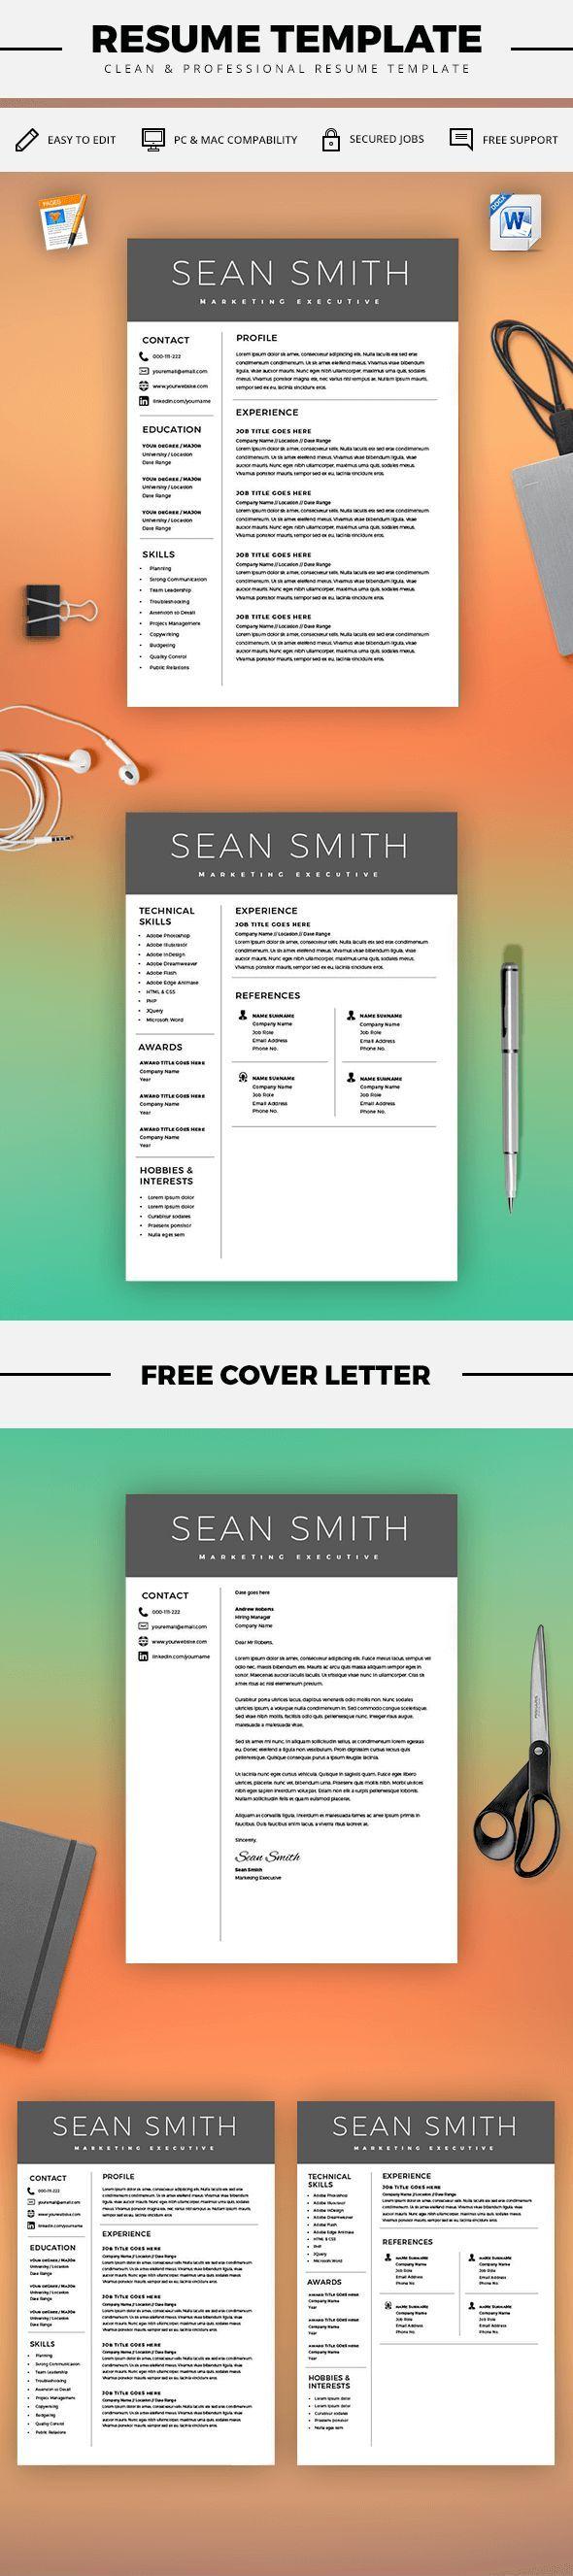 Curriculum Vitae Template Professional Resume Template Cover